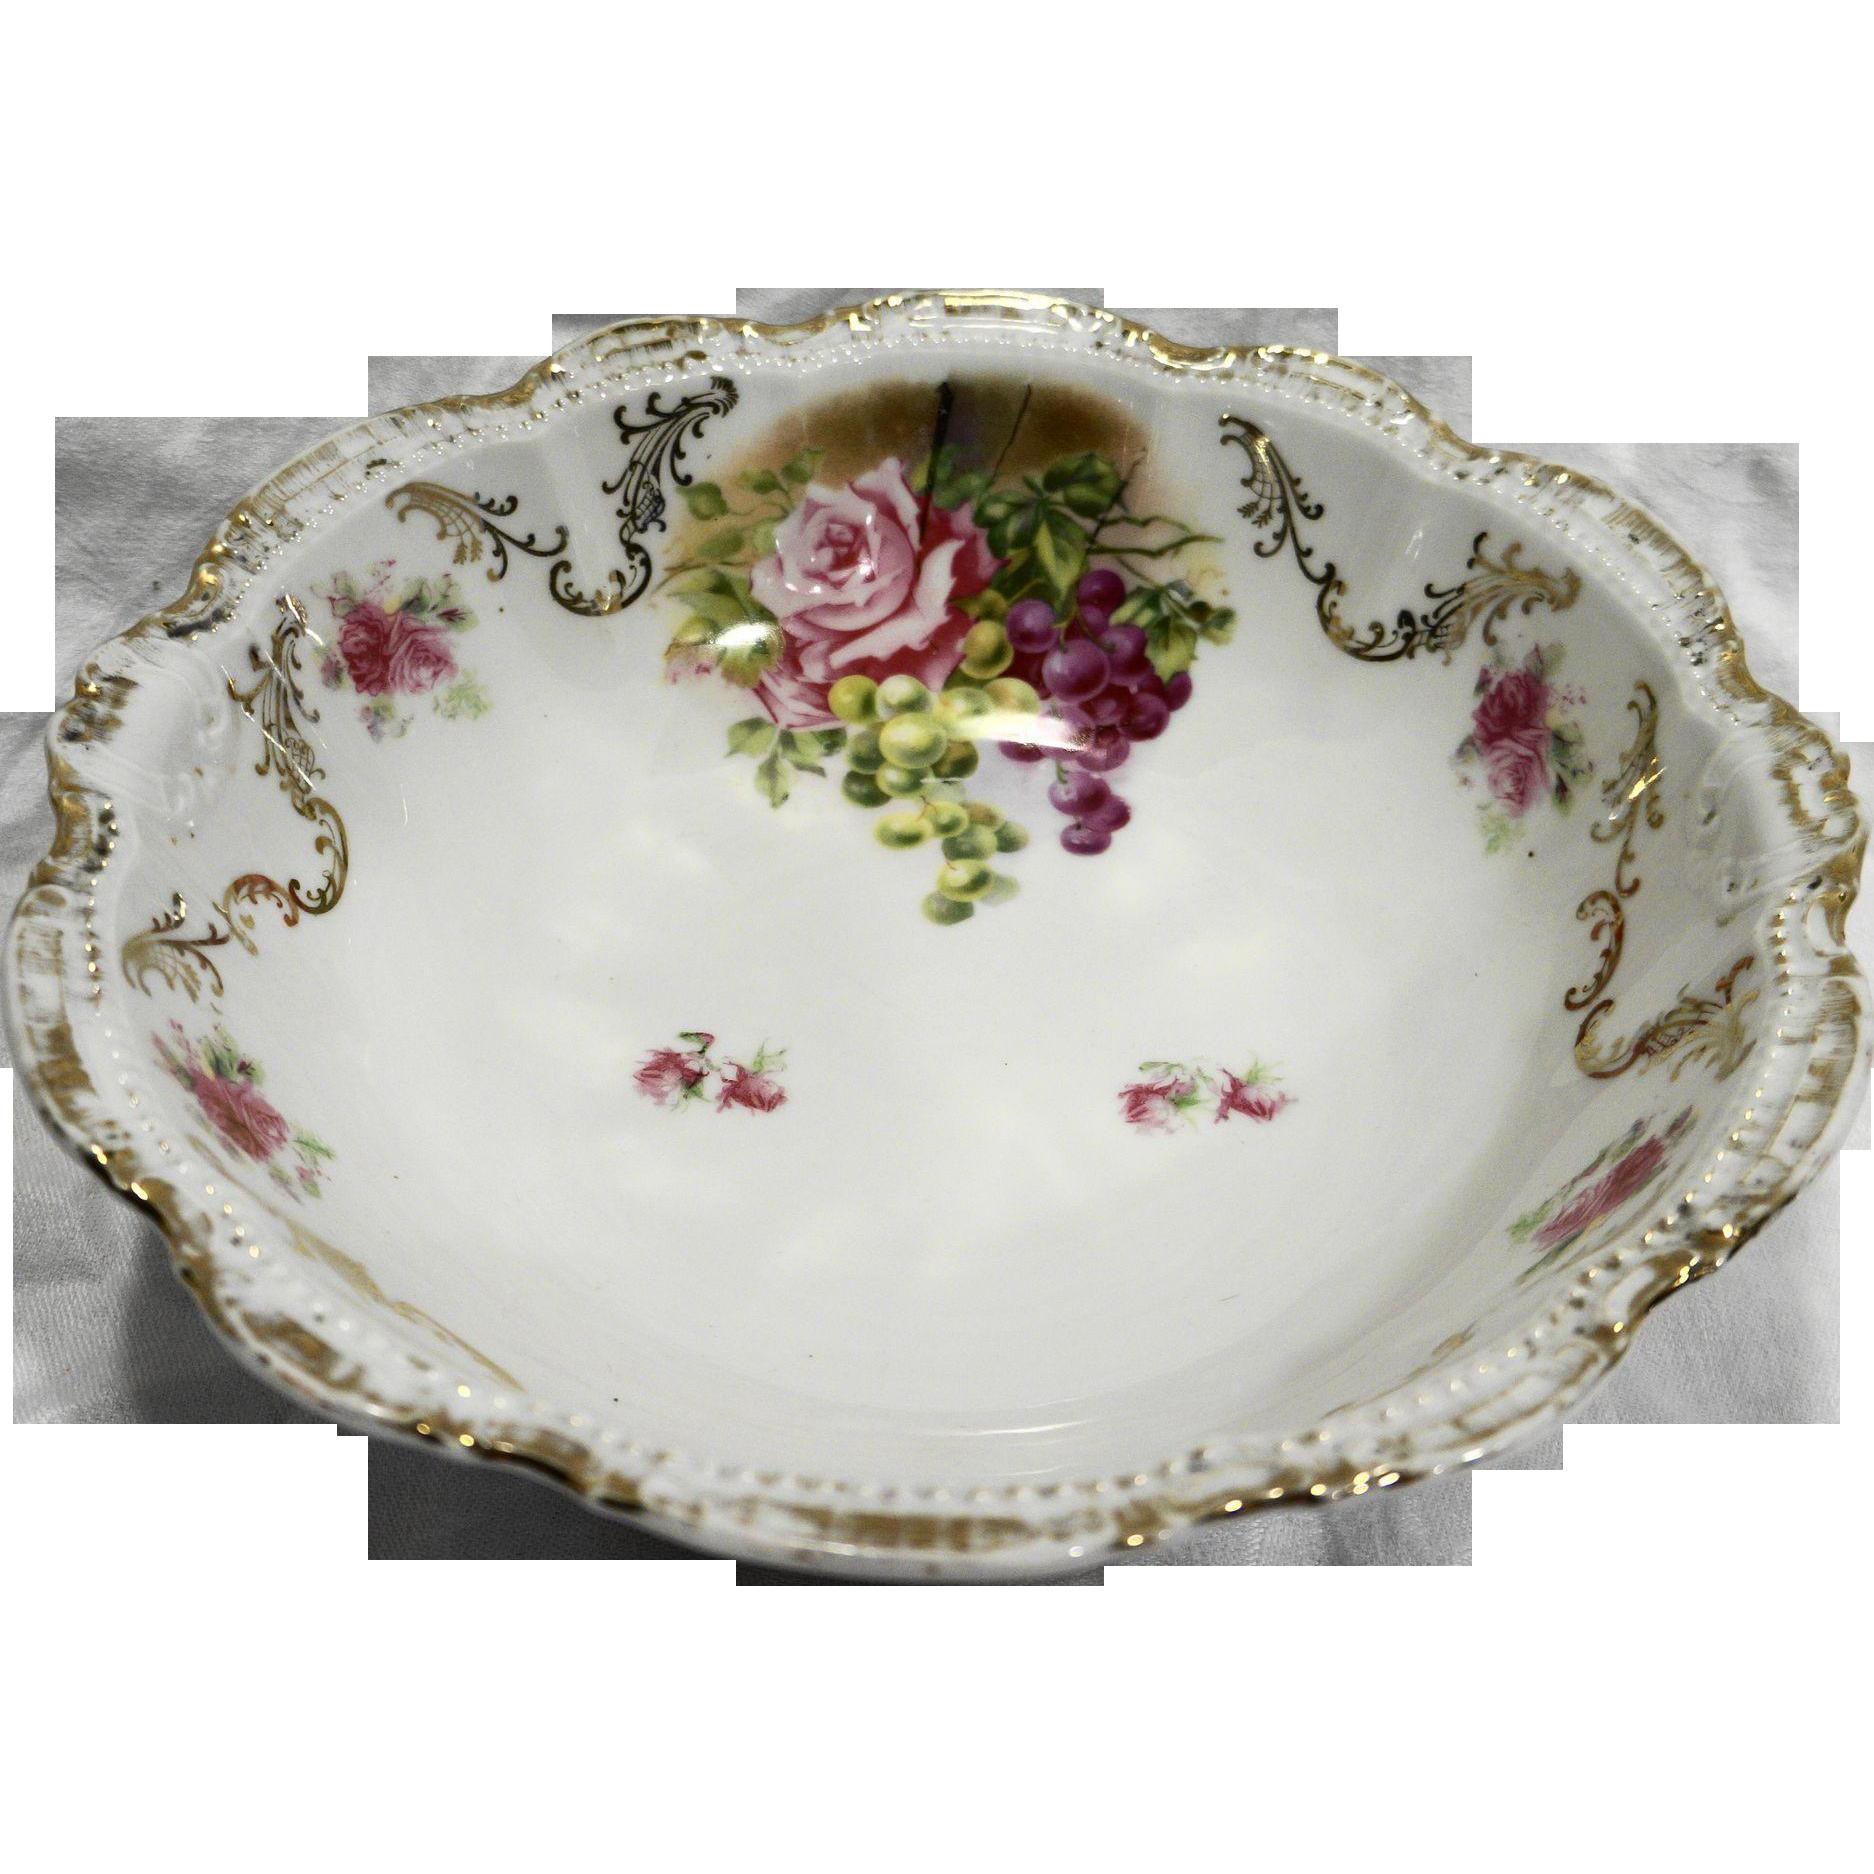 PM Porzellanfabrik Moschendorf Bavaria Antique Bowl 10 IN Roses Gold